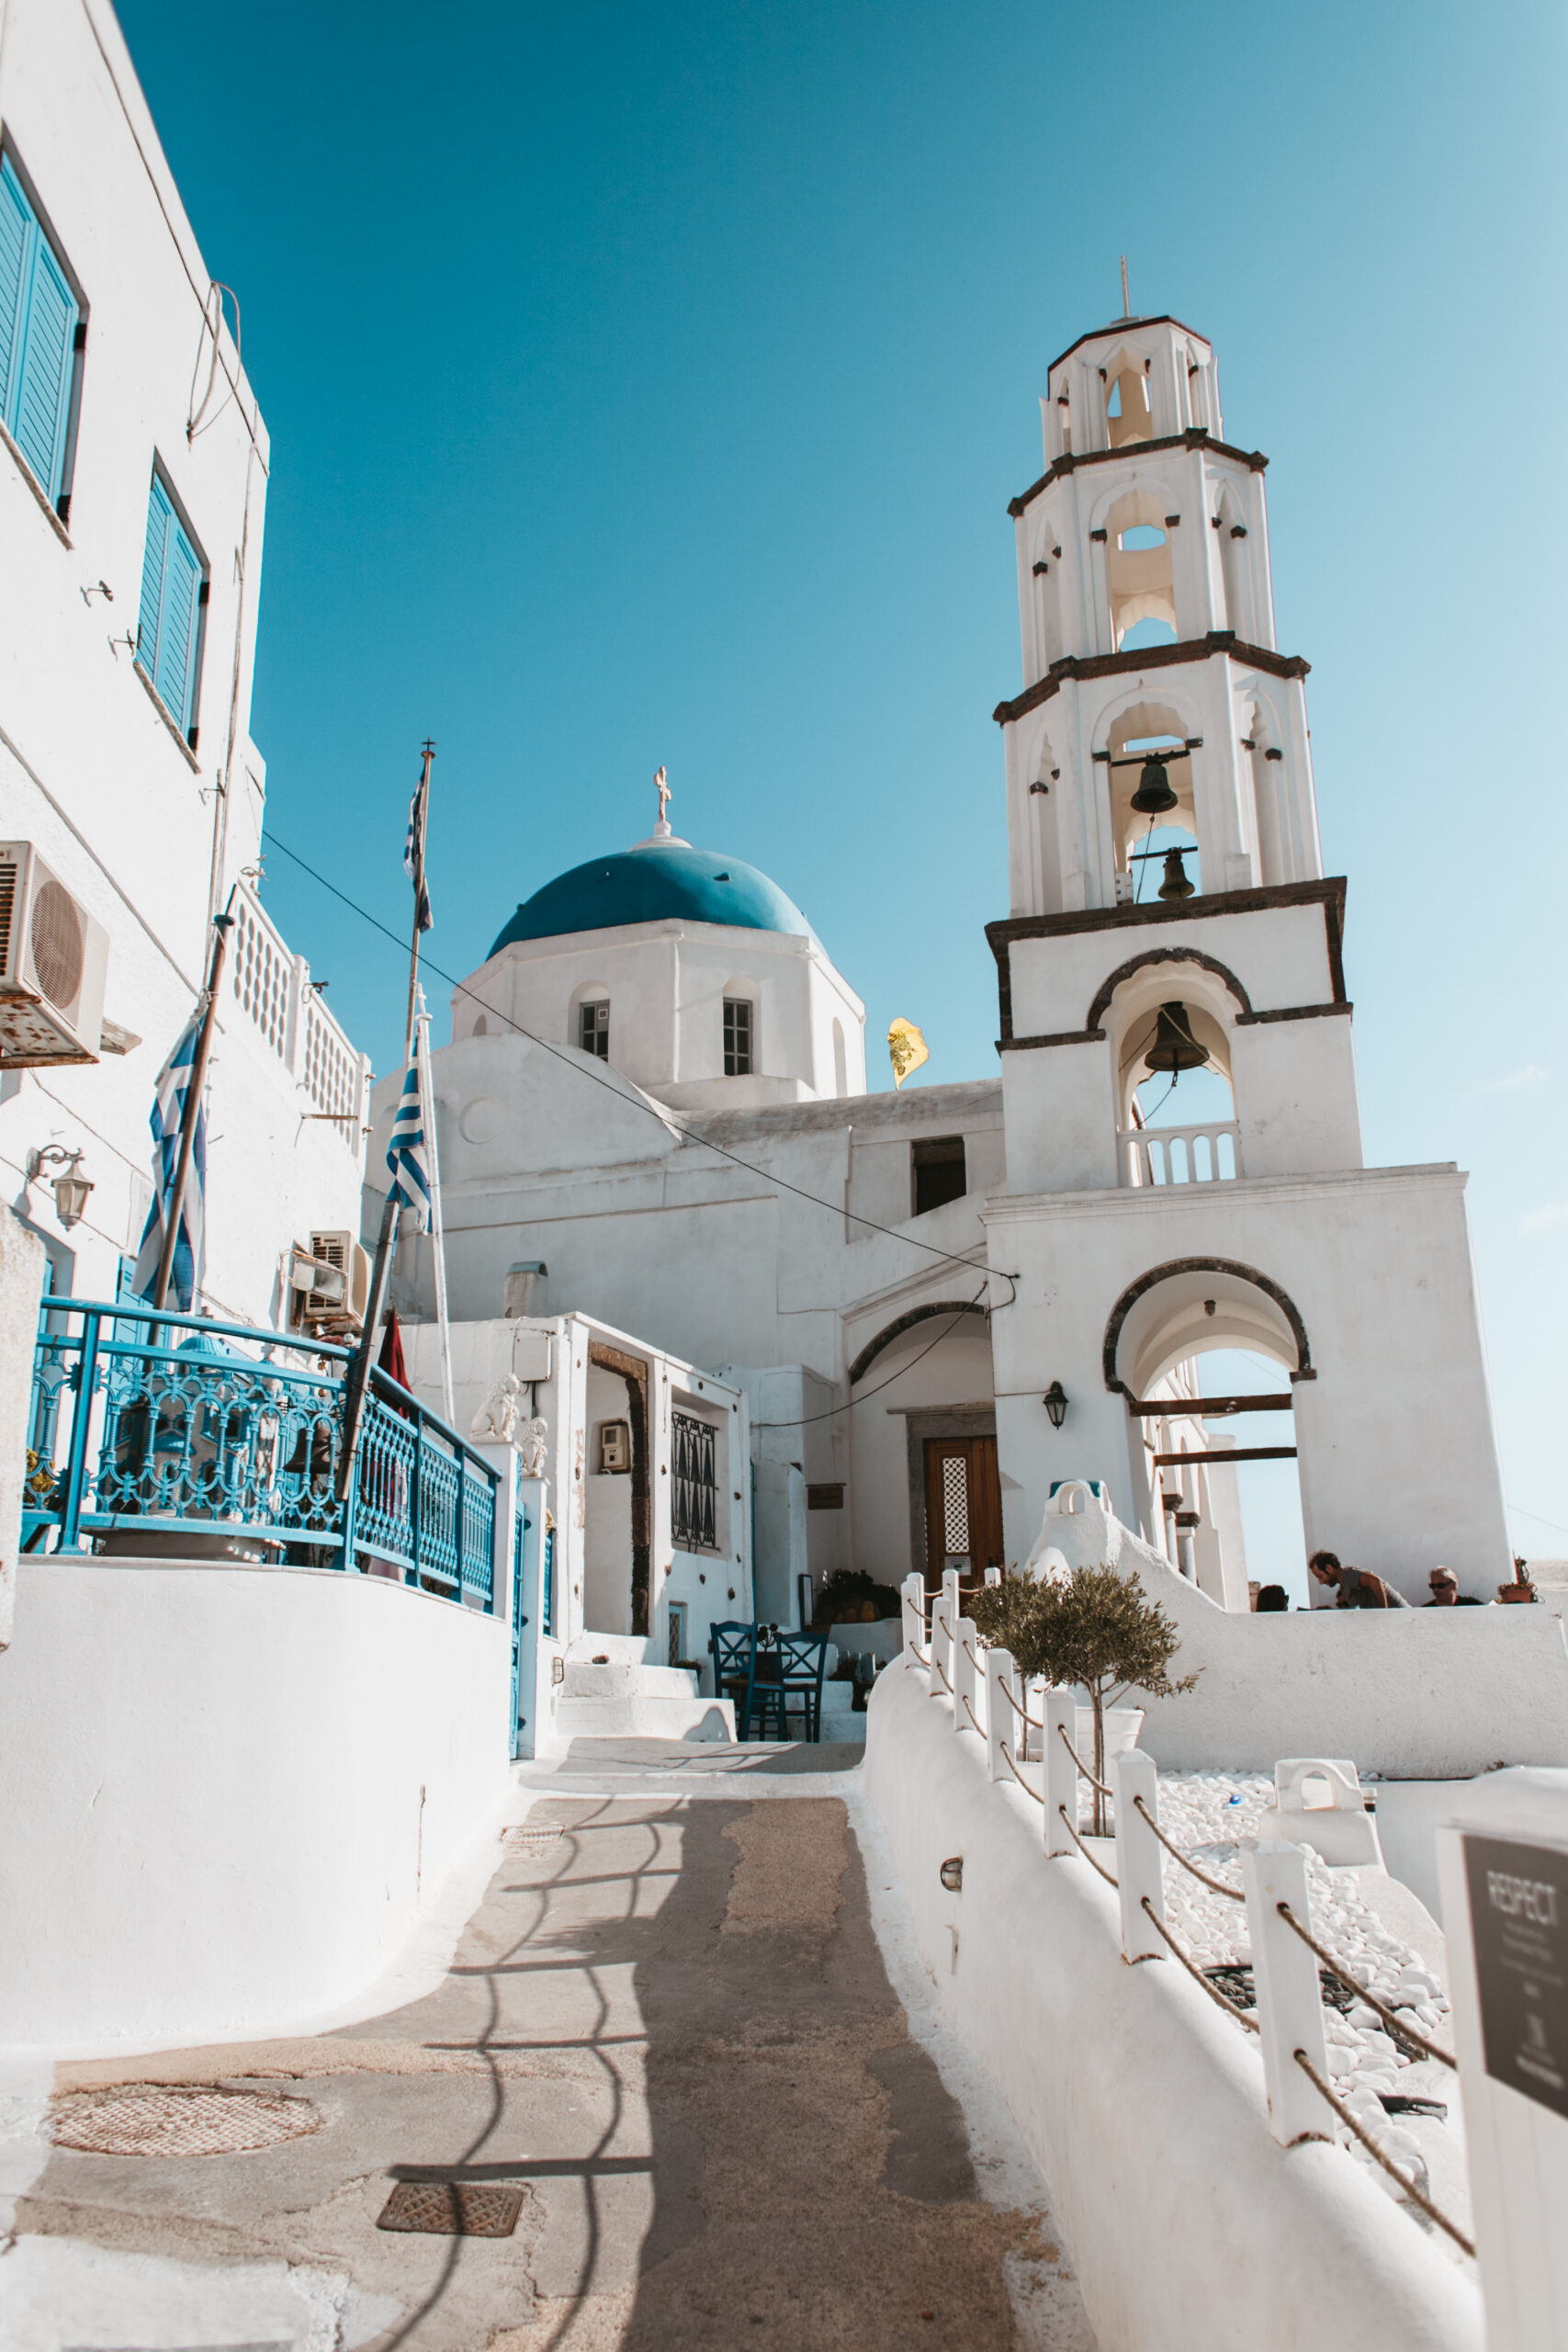 Pyrgos Santorini kosciol dzwonnica niebieska kopula Grecja